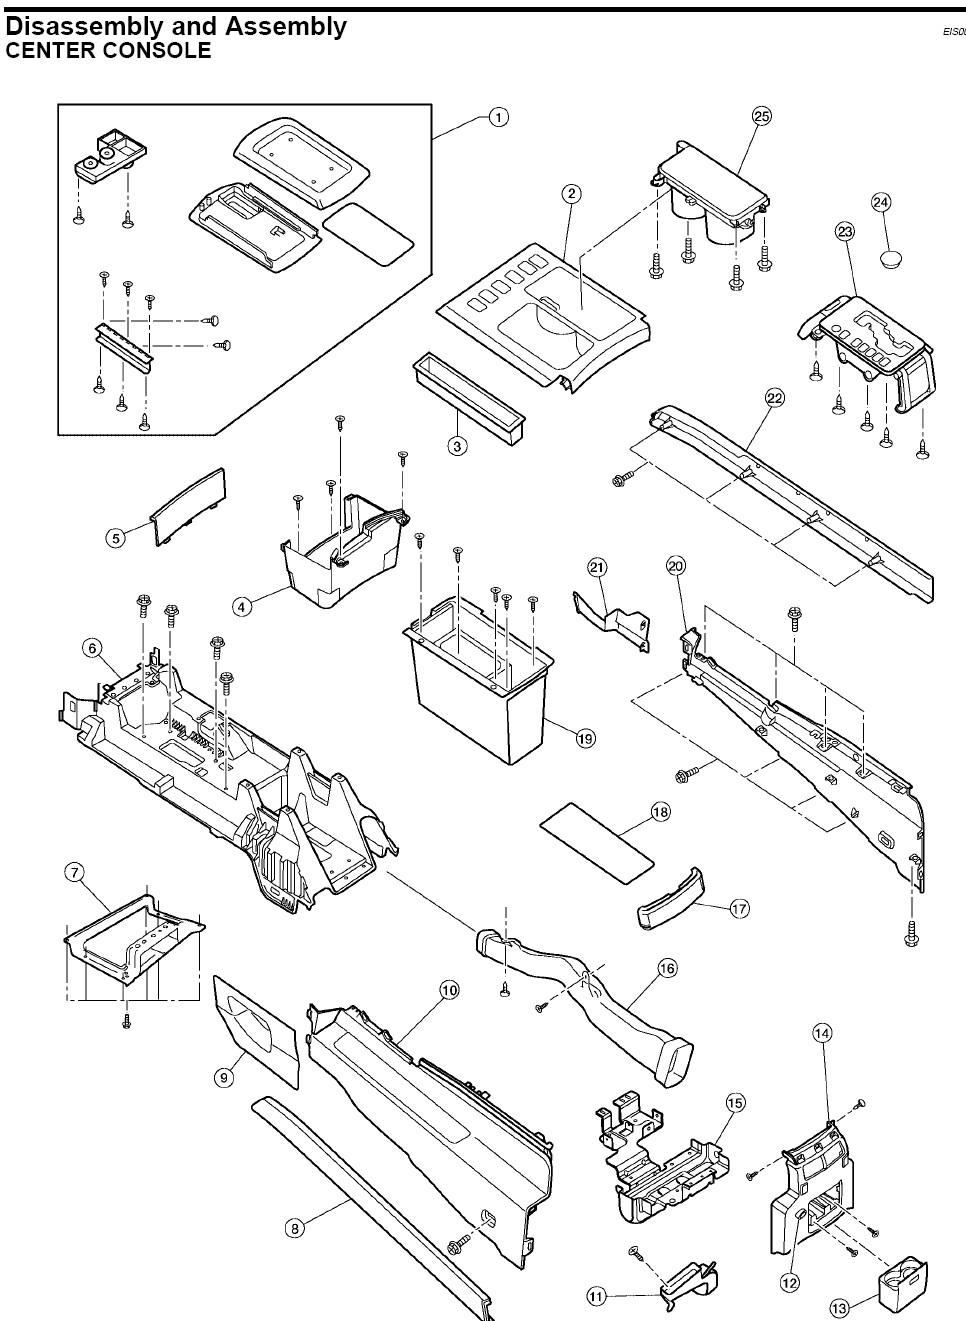 Nissan titan interior parts diagram - Nissan titan interior accessories ...